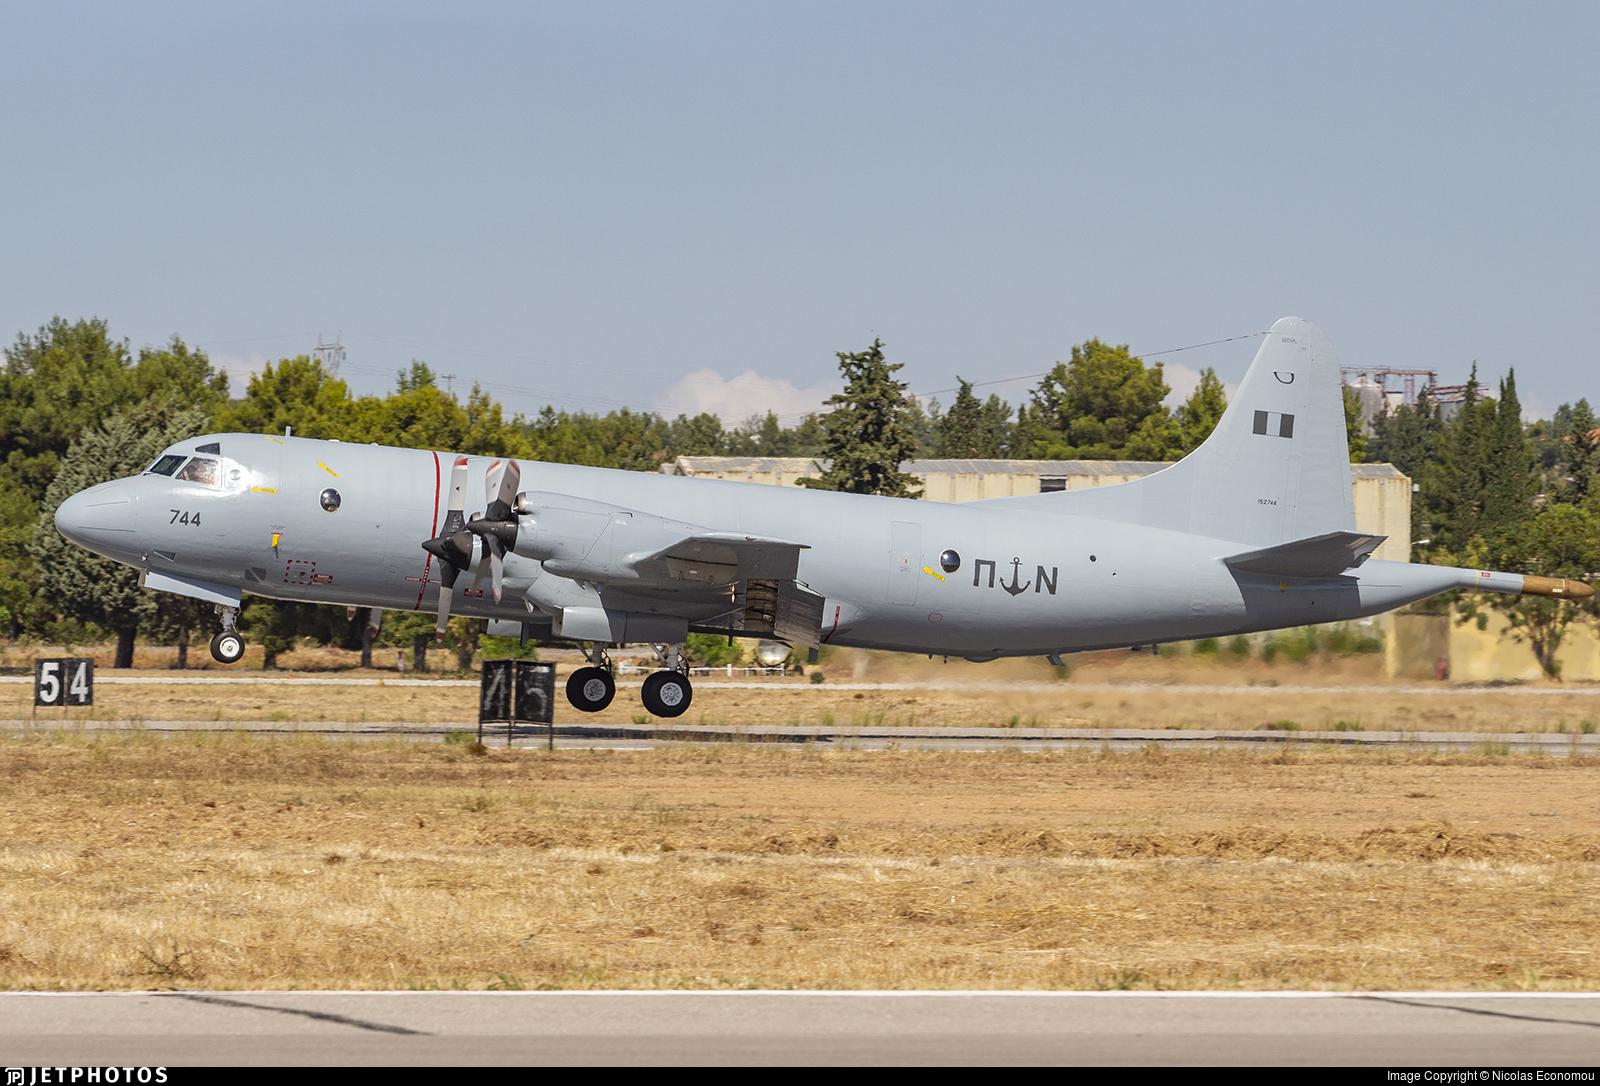 152744 - Lockheed P-3B Orion - Greece - Navy